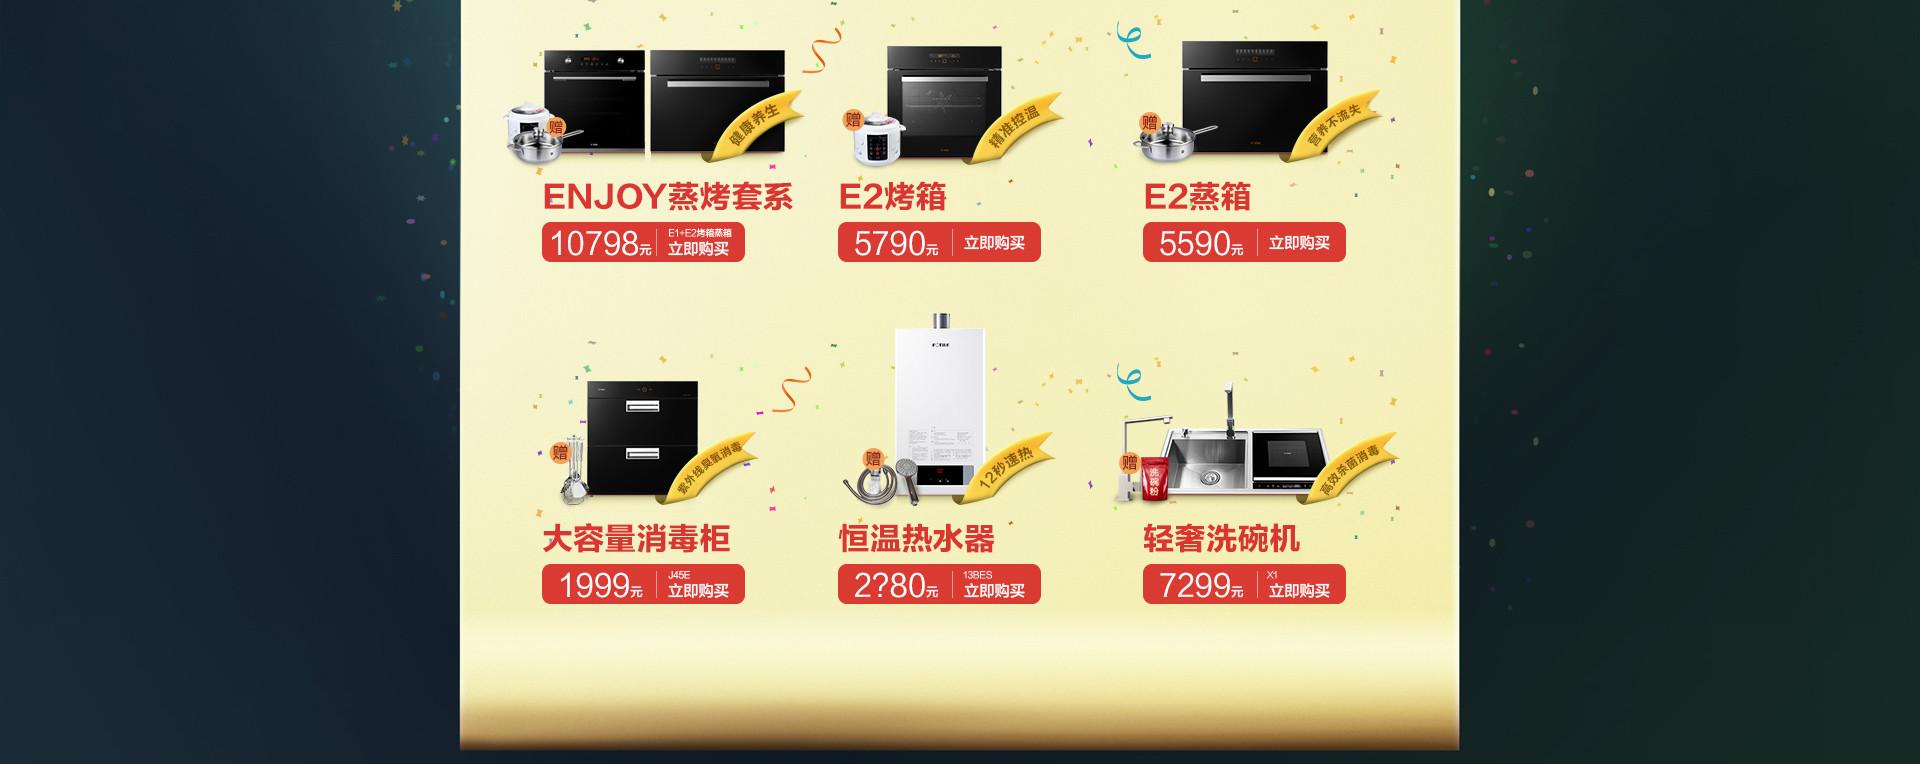 http://image.suning.cn/uimg/sop/commodity/194443364230765656230330_x.jpg